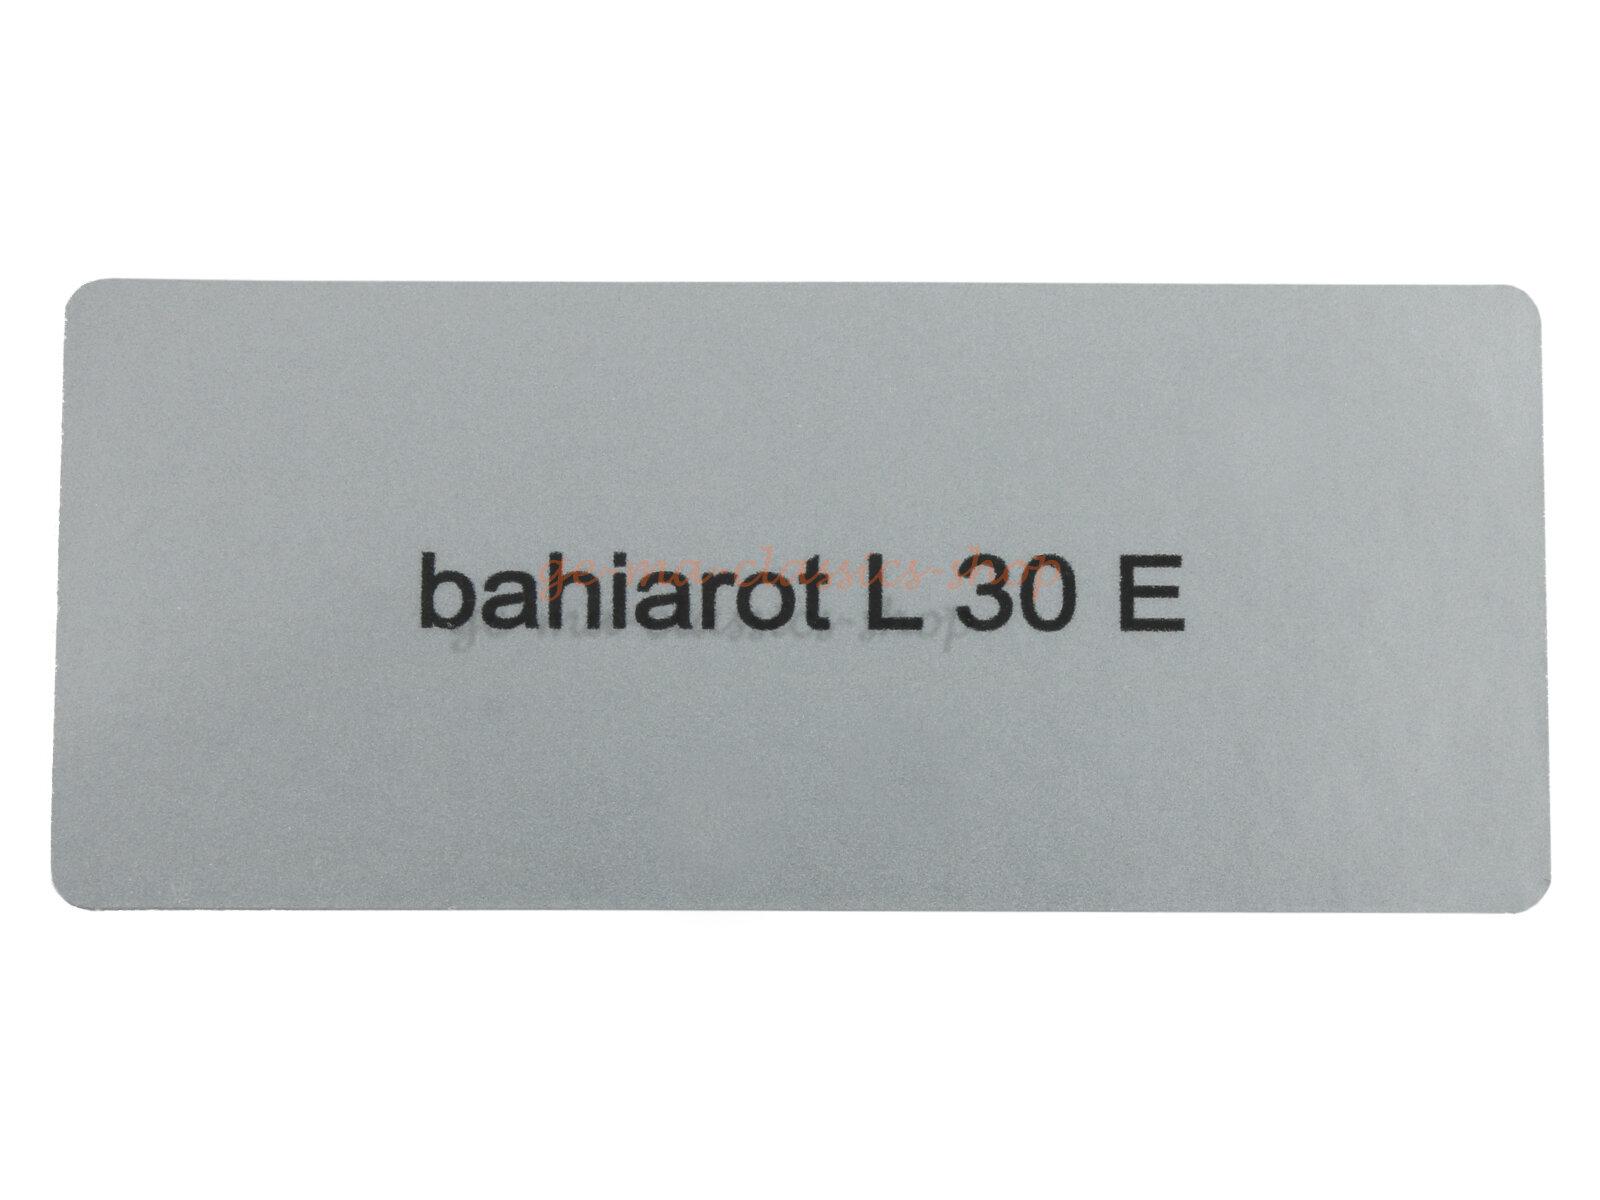 "Aufkleber ""bahiarot L 30 E"""